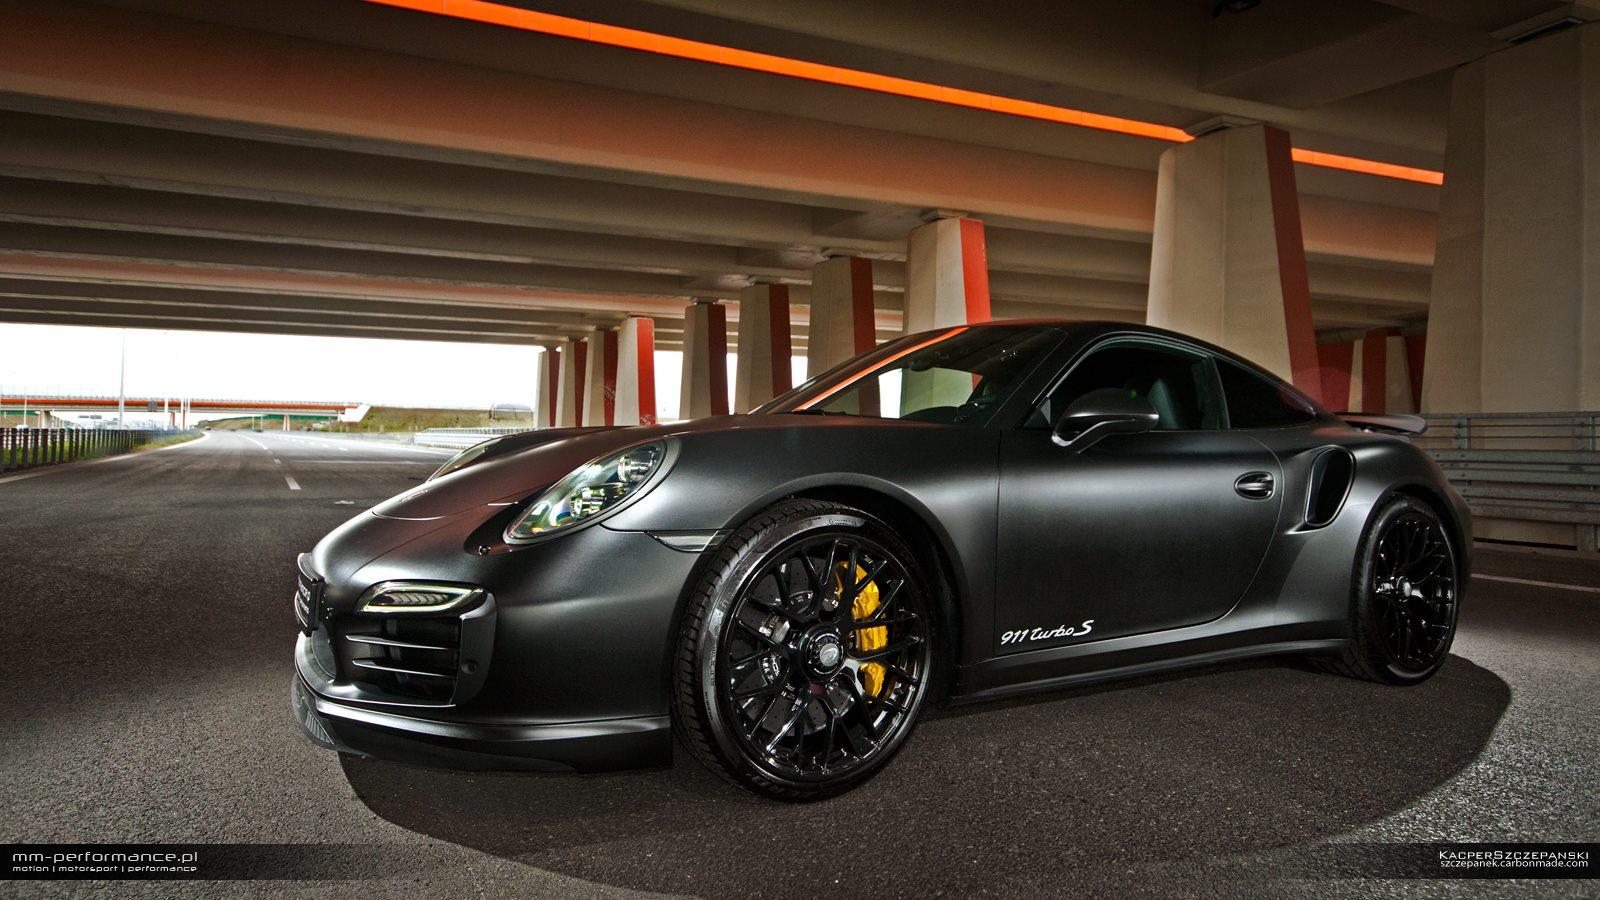 2014 mm performance porsche 911 turbo s dark cars wallpapers. Black Bedroom Furniture Sets. Home Design Ideas